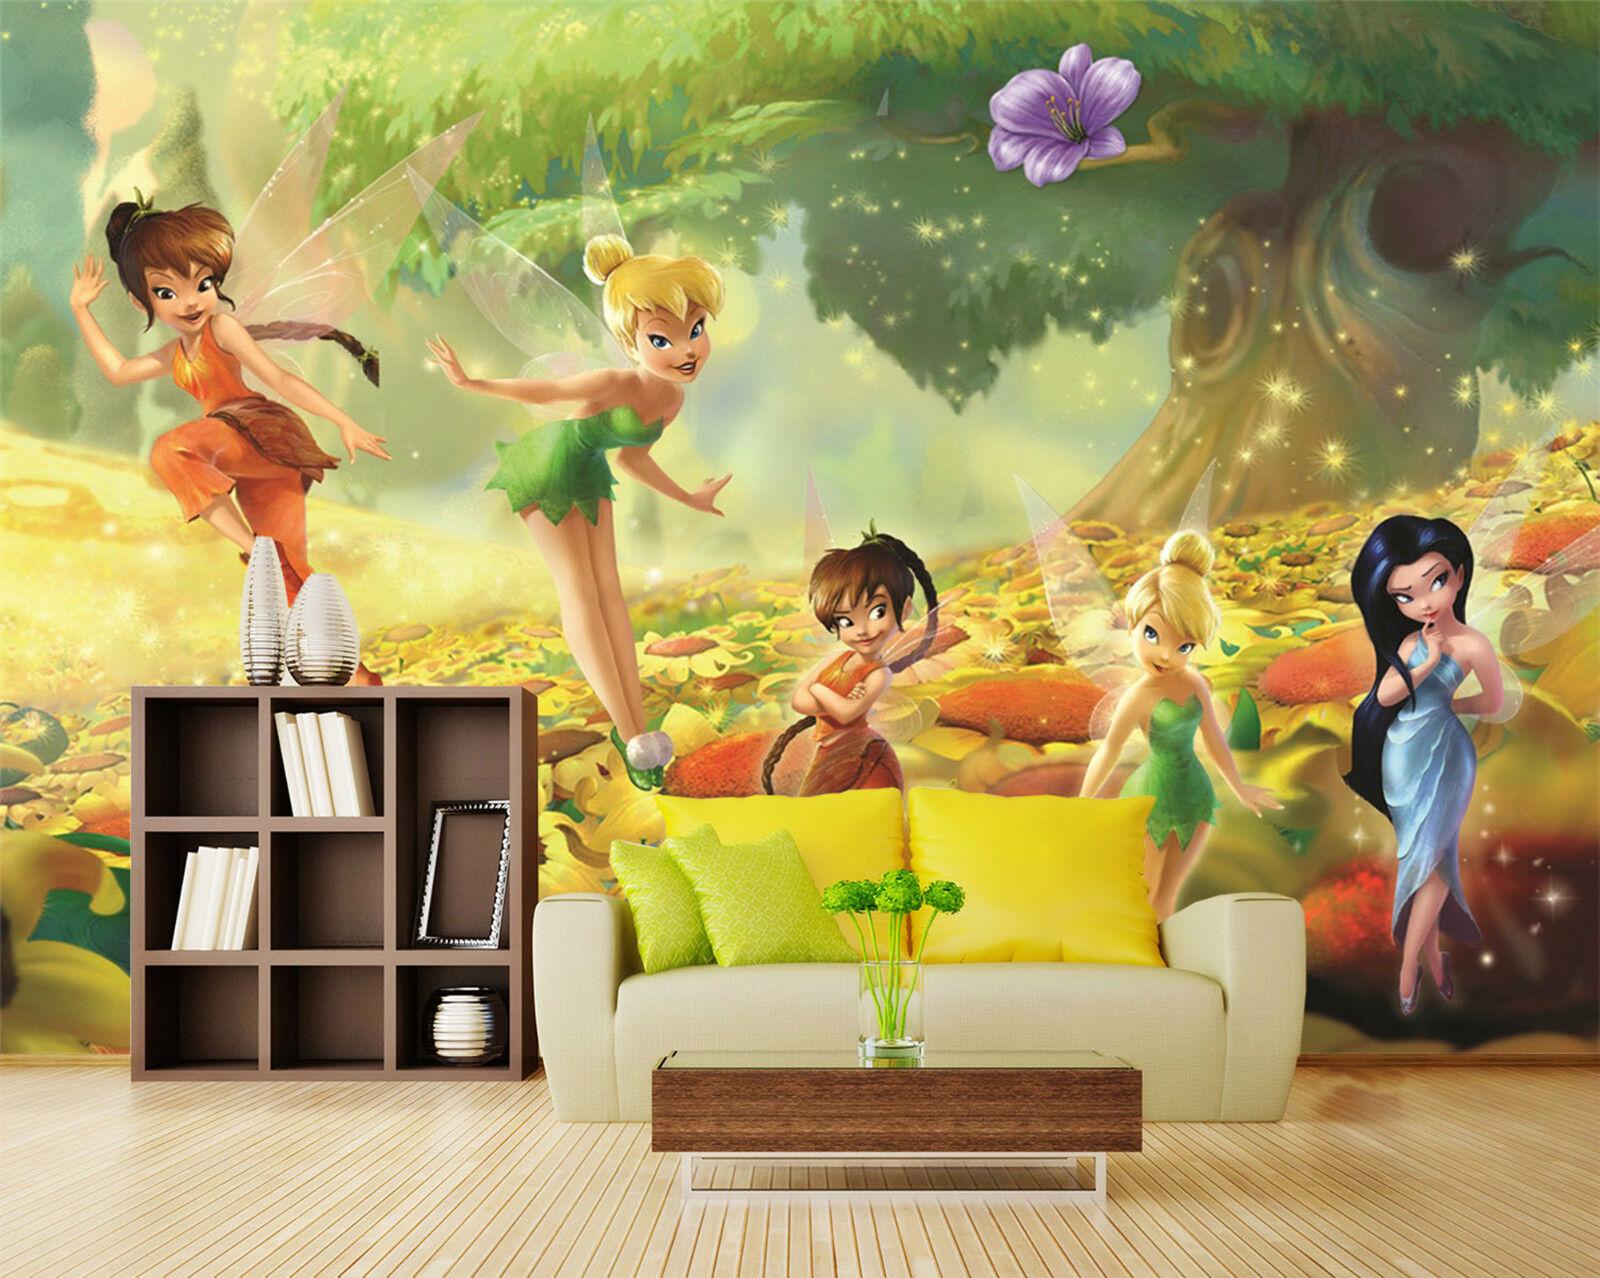 3D Magie 4532 Fototapeten Wandbild Fototapete Bild Tapete Familie Kinder DE